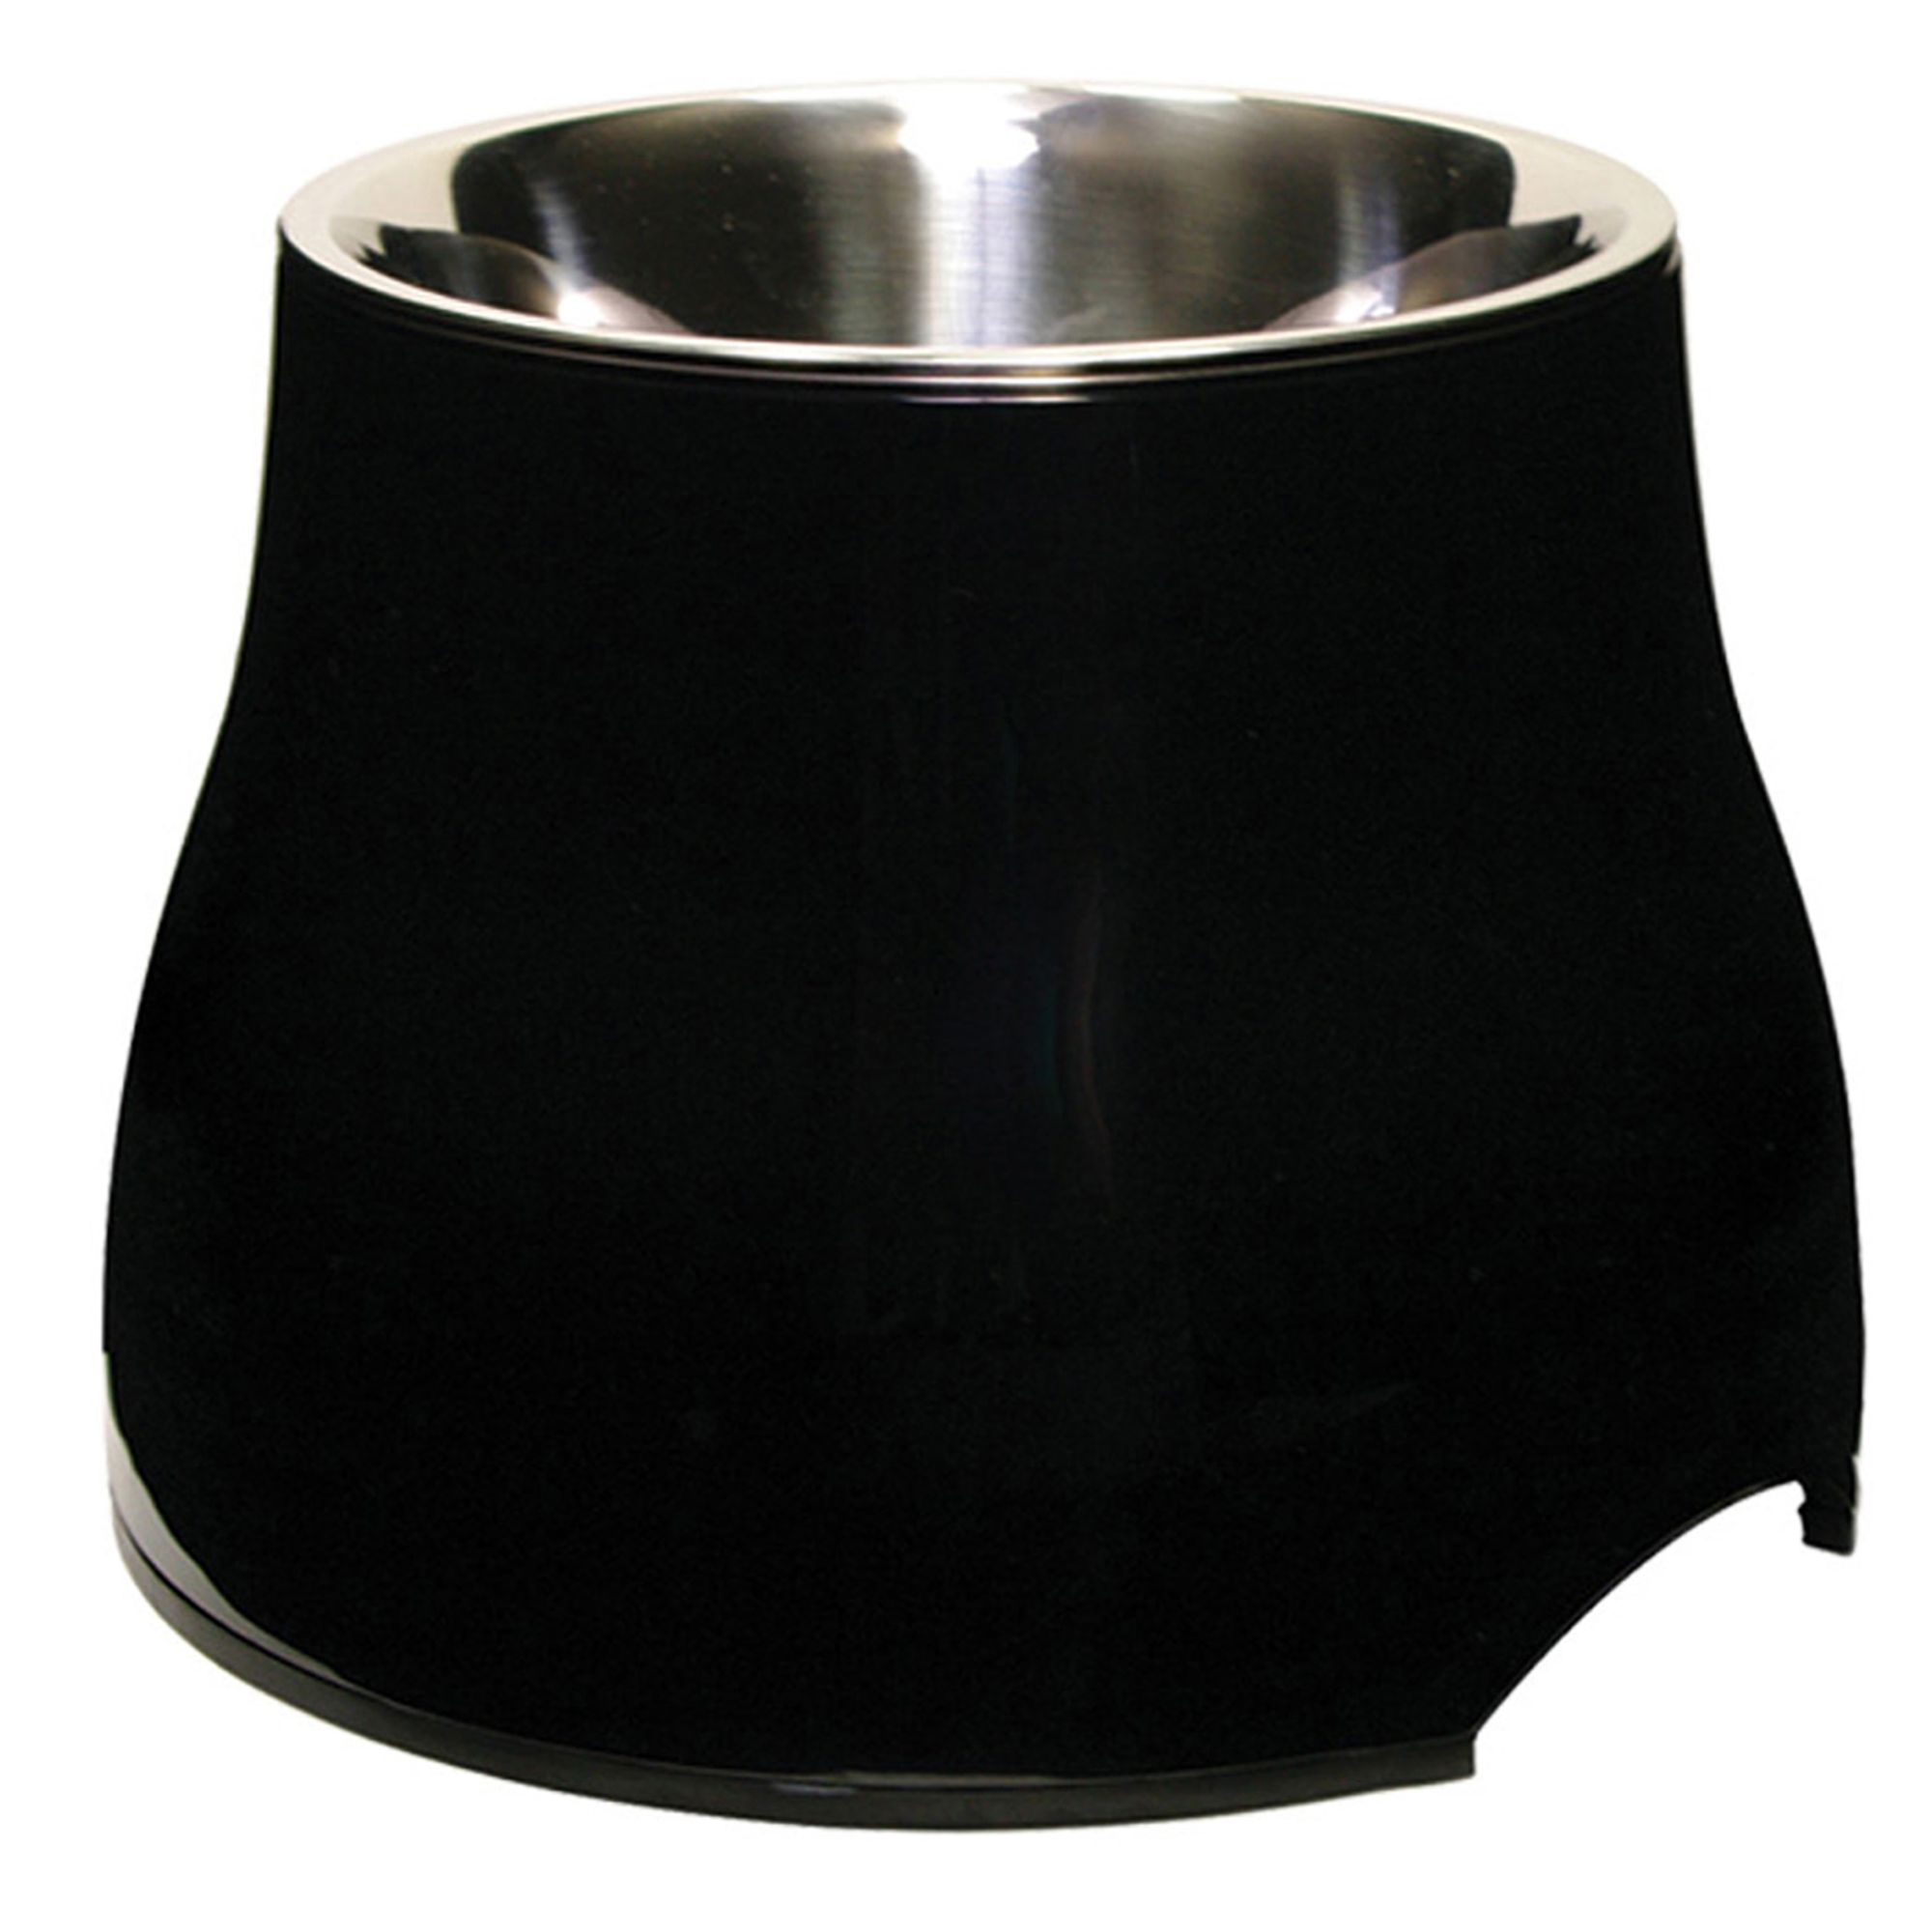 Dogit Elevated Dog Bowl Size 30.4 Fl Oz Black